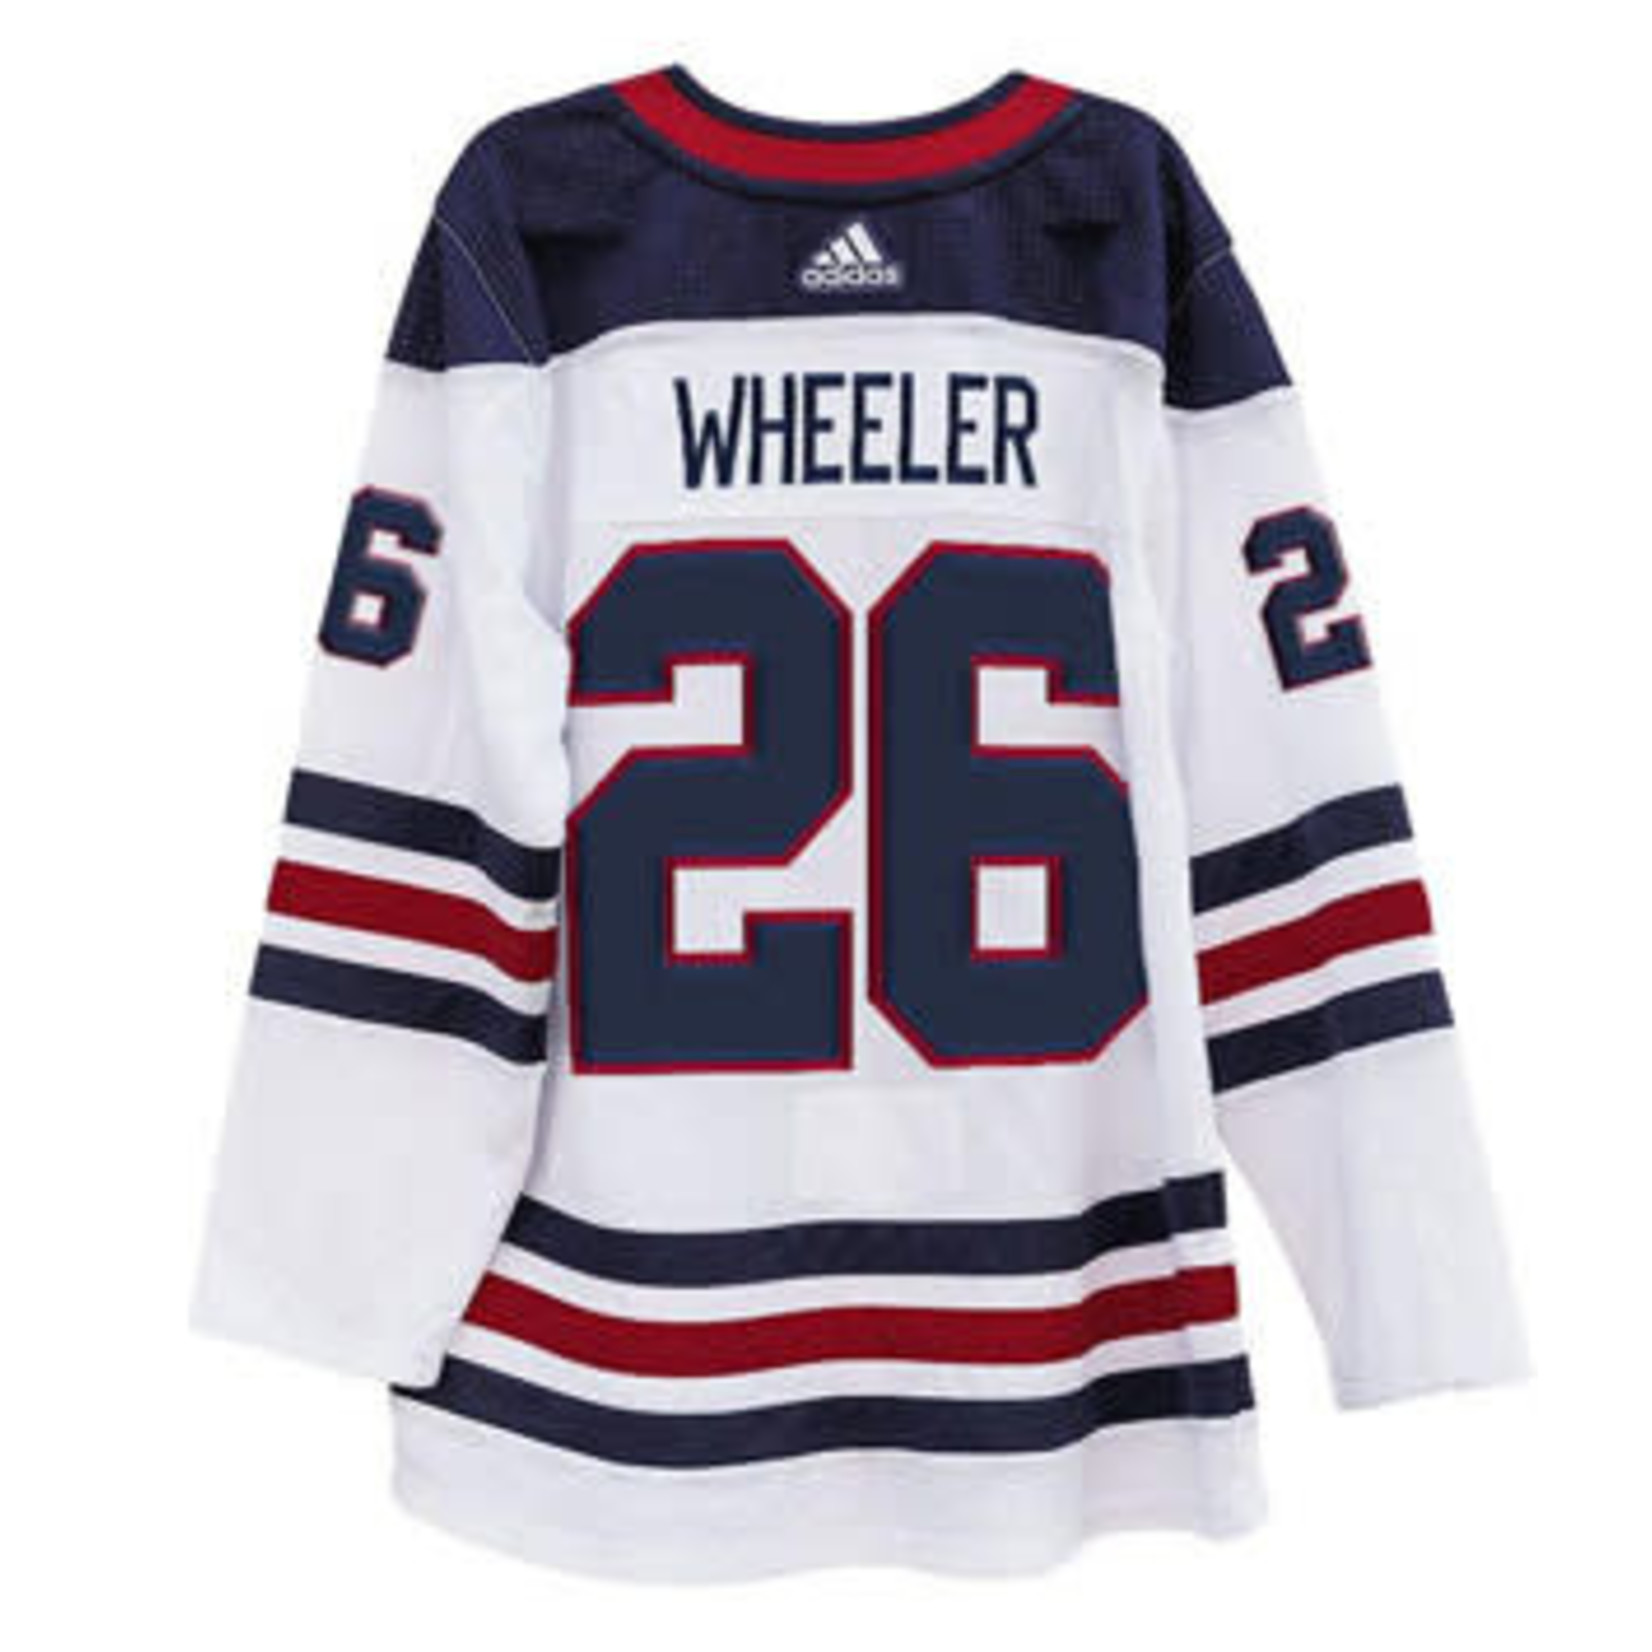 Adidas Adidas Hockey Jersey, Authentic, Mens, NHL, Winnipeg Jets, Heritage Wht, Blake Wheeler